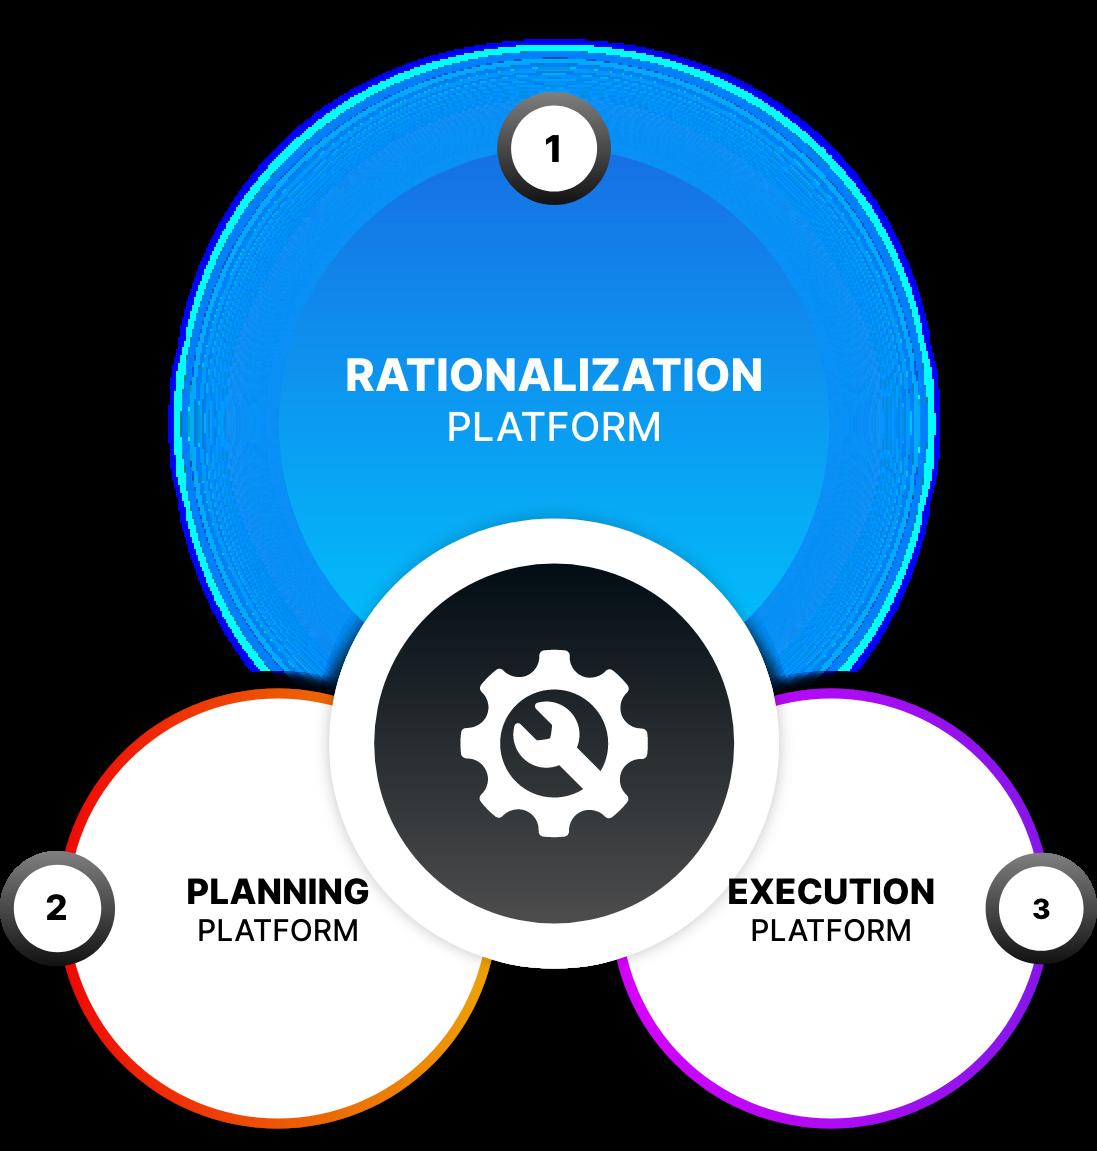 Rationalization Platform Image